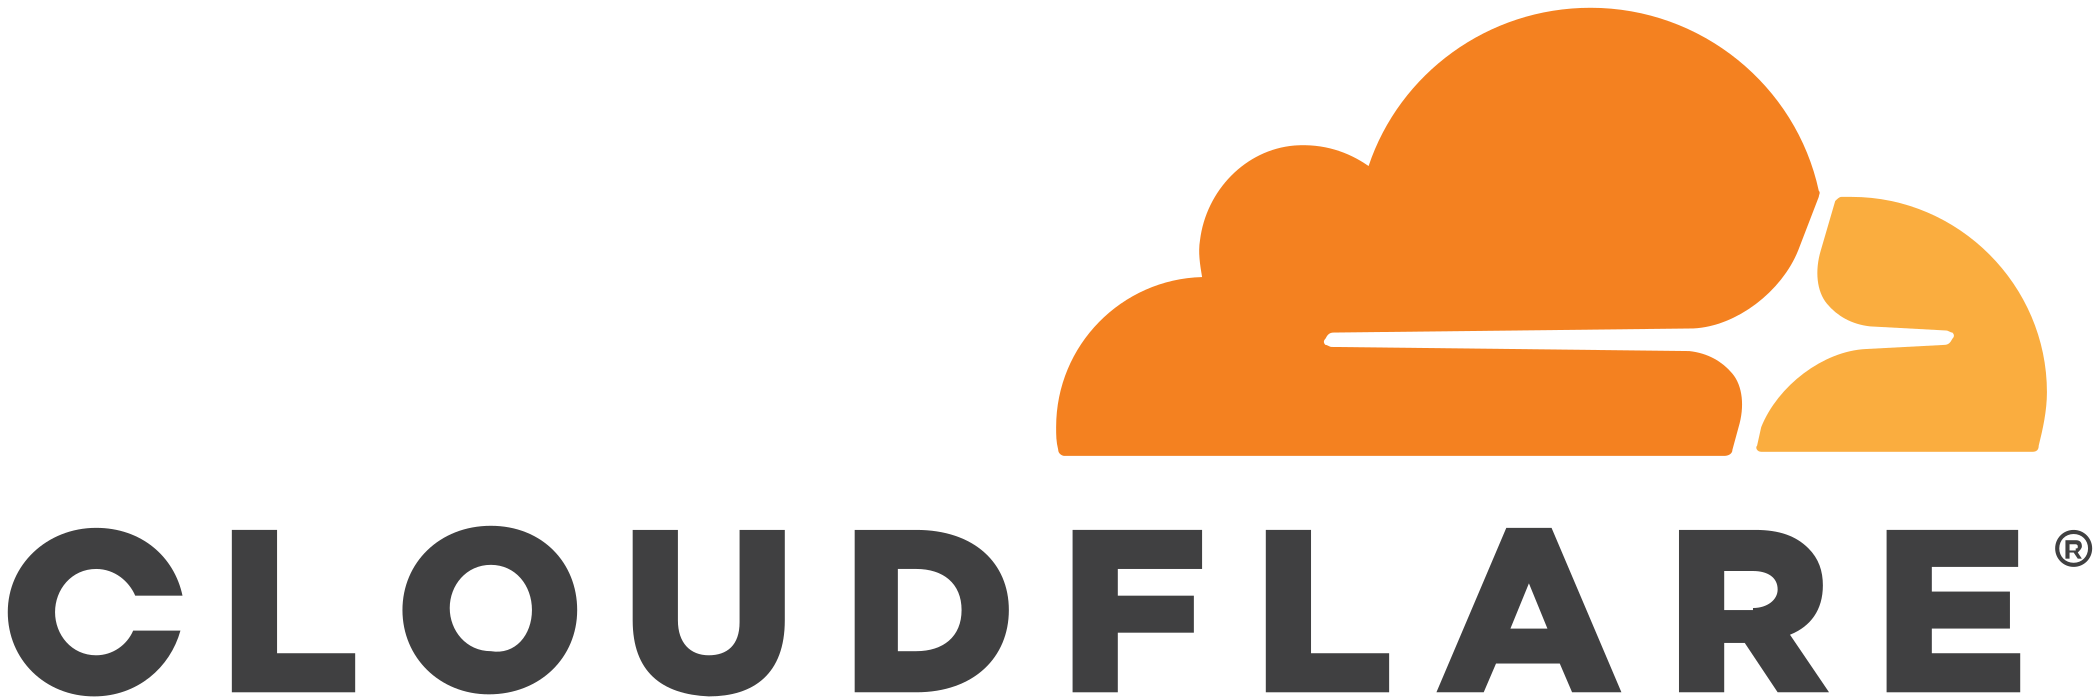 Cloudflare logo 2 - Cloudflare Logo